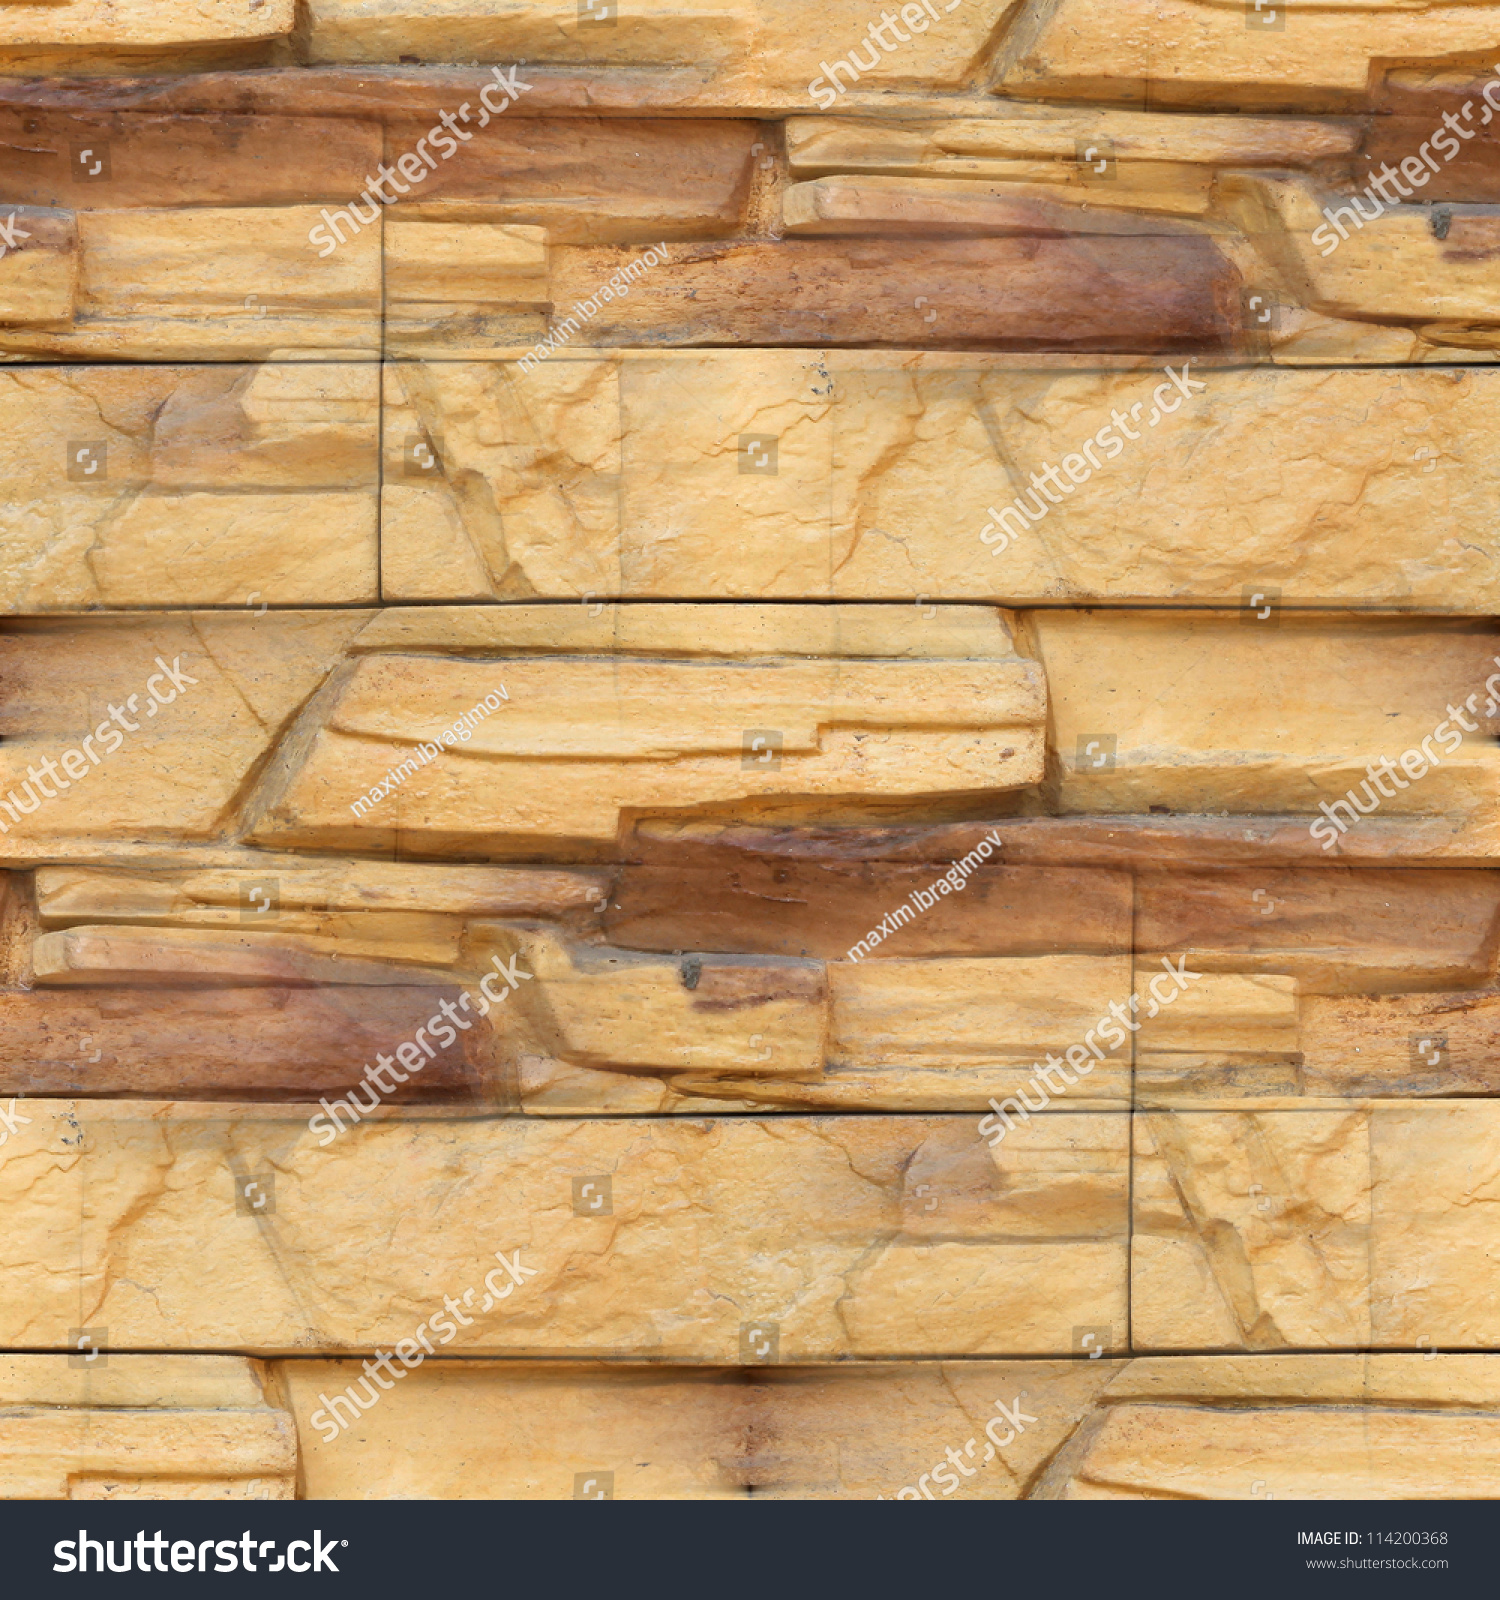 Granite Floor Wallpaper Decorative Brick Wall Stock Photo (Royalty ...